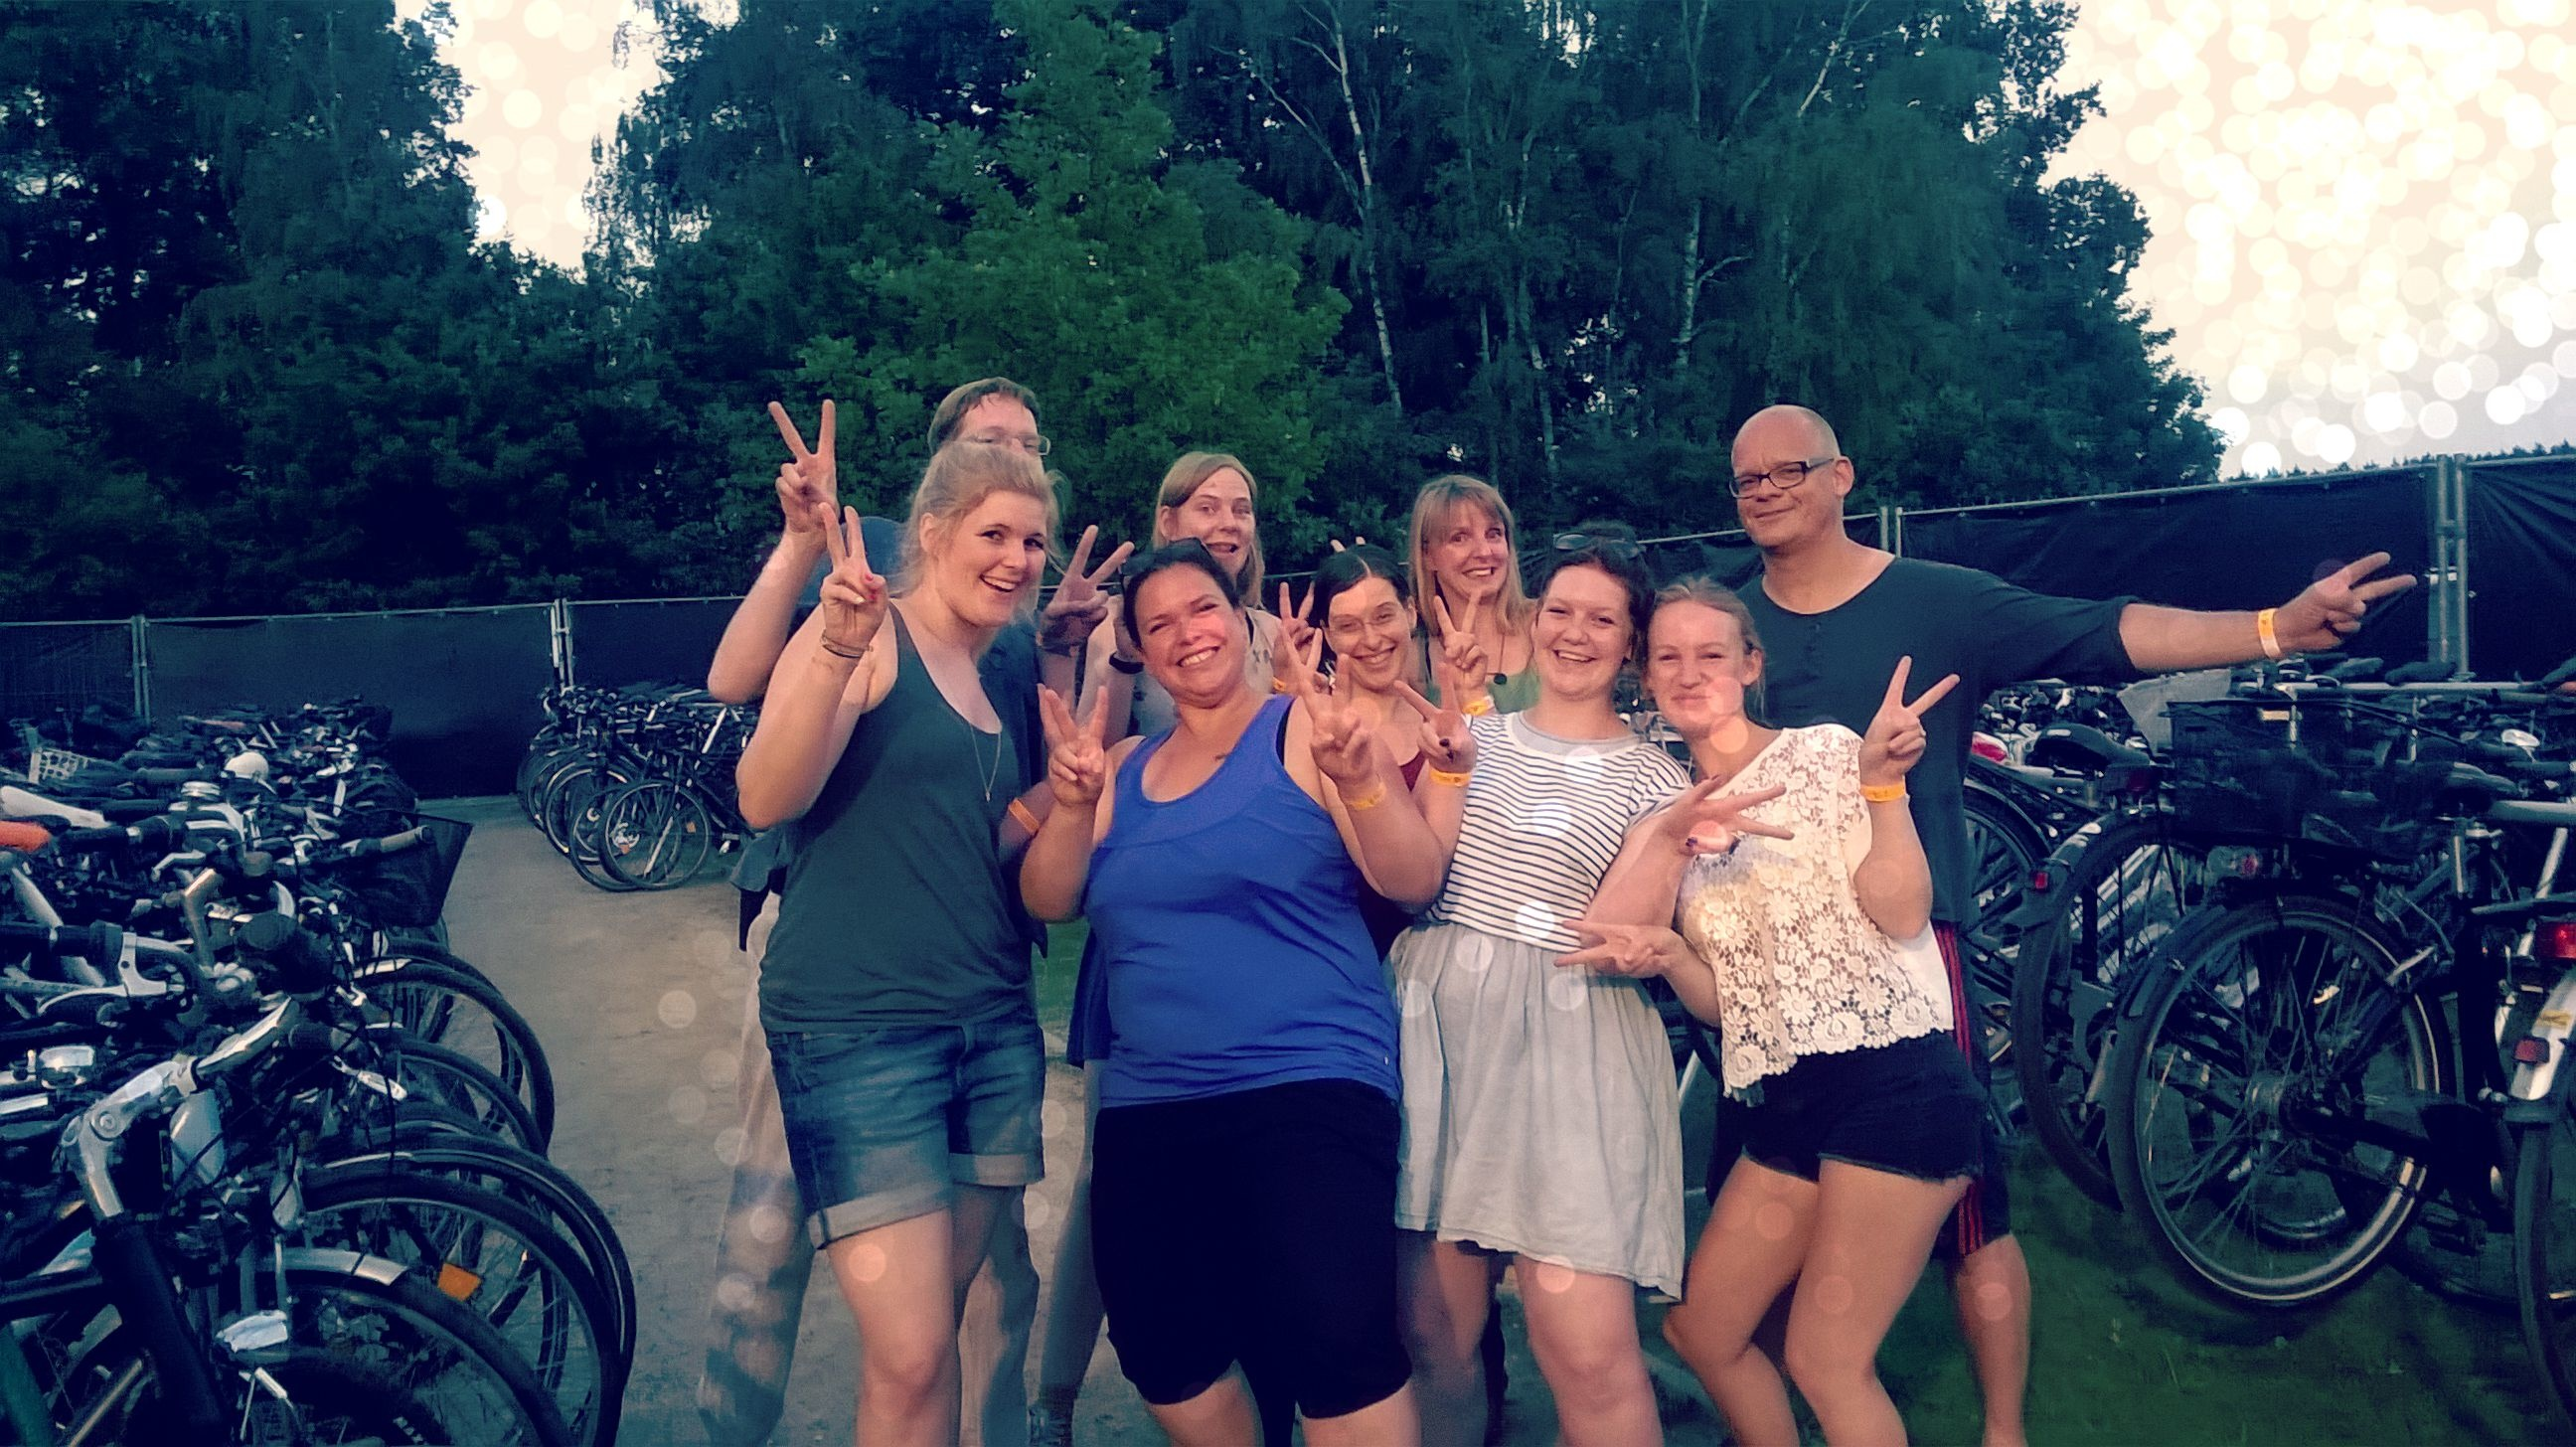 Team_FahrradGarderobe_beim_A_Summers_Tale_Festival_2.jpg